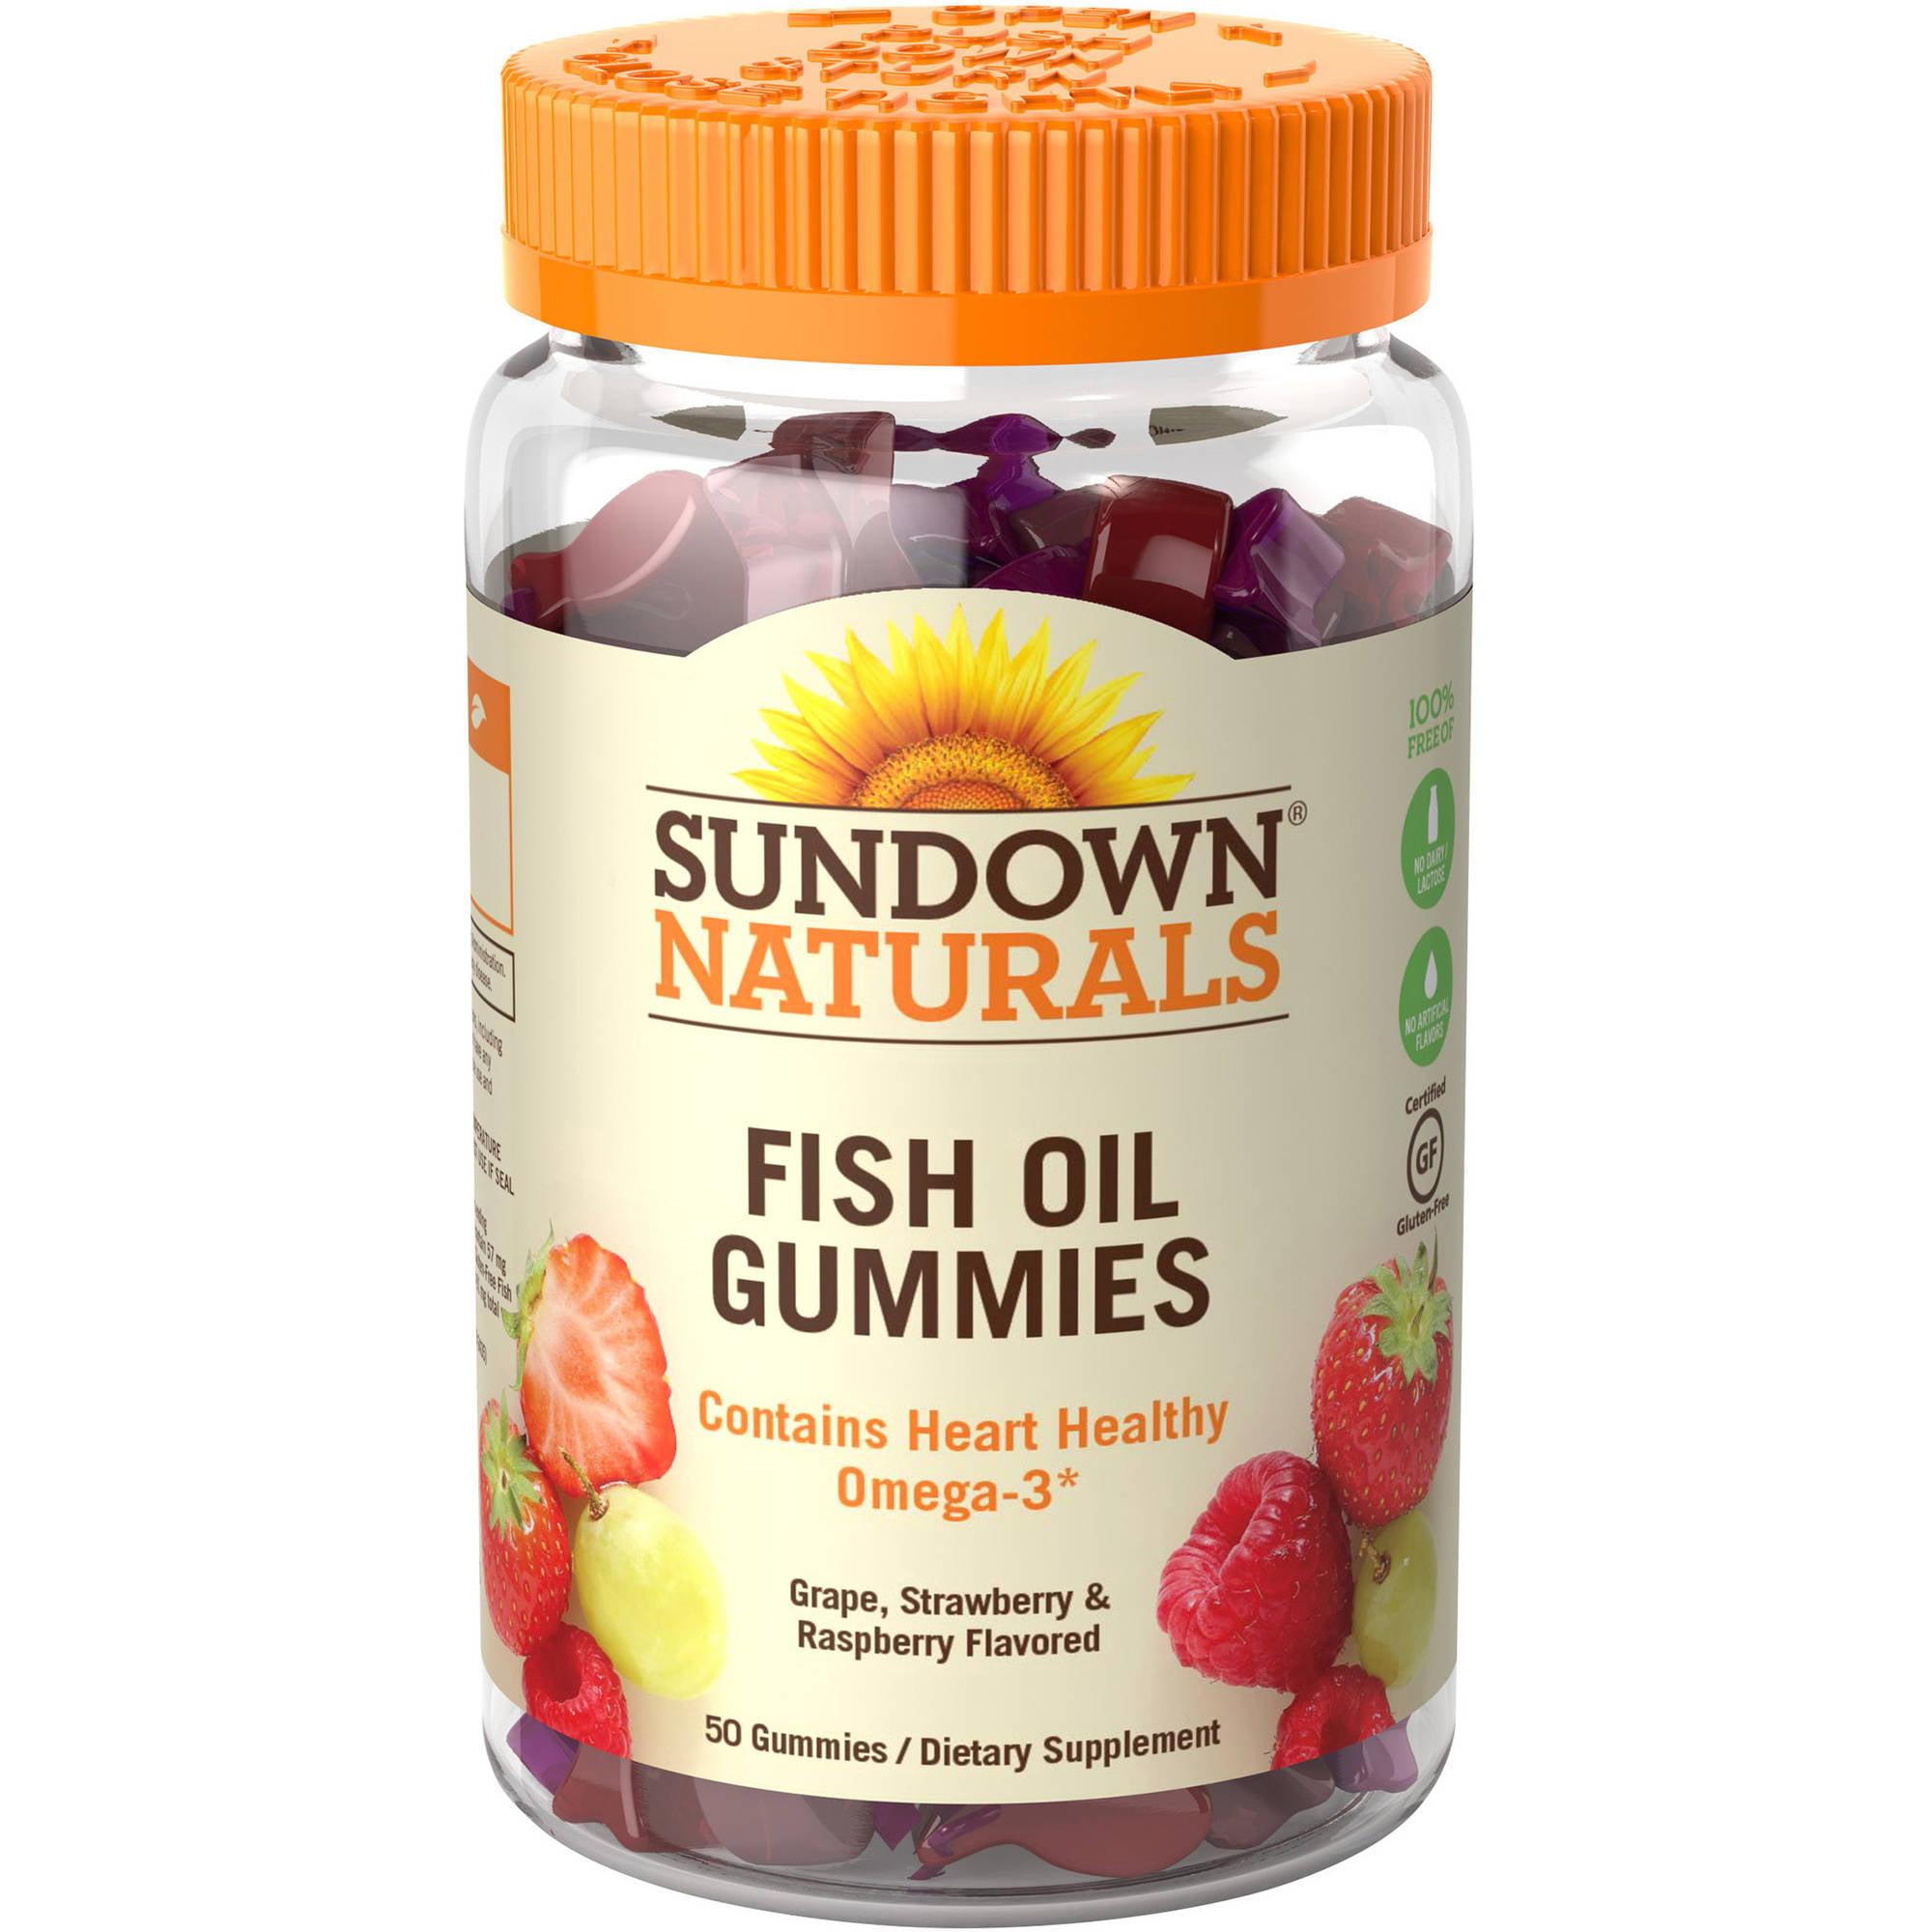 Sundown Naturals Fish Oil Omega-3 EPA/DHA with Vitamin D3 Dietary Supplement Gluten-Free Gummies ...